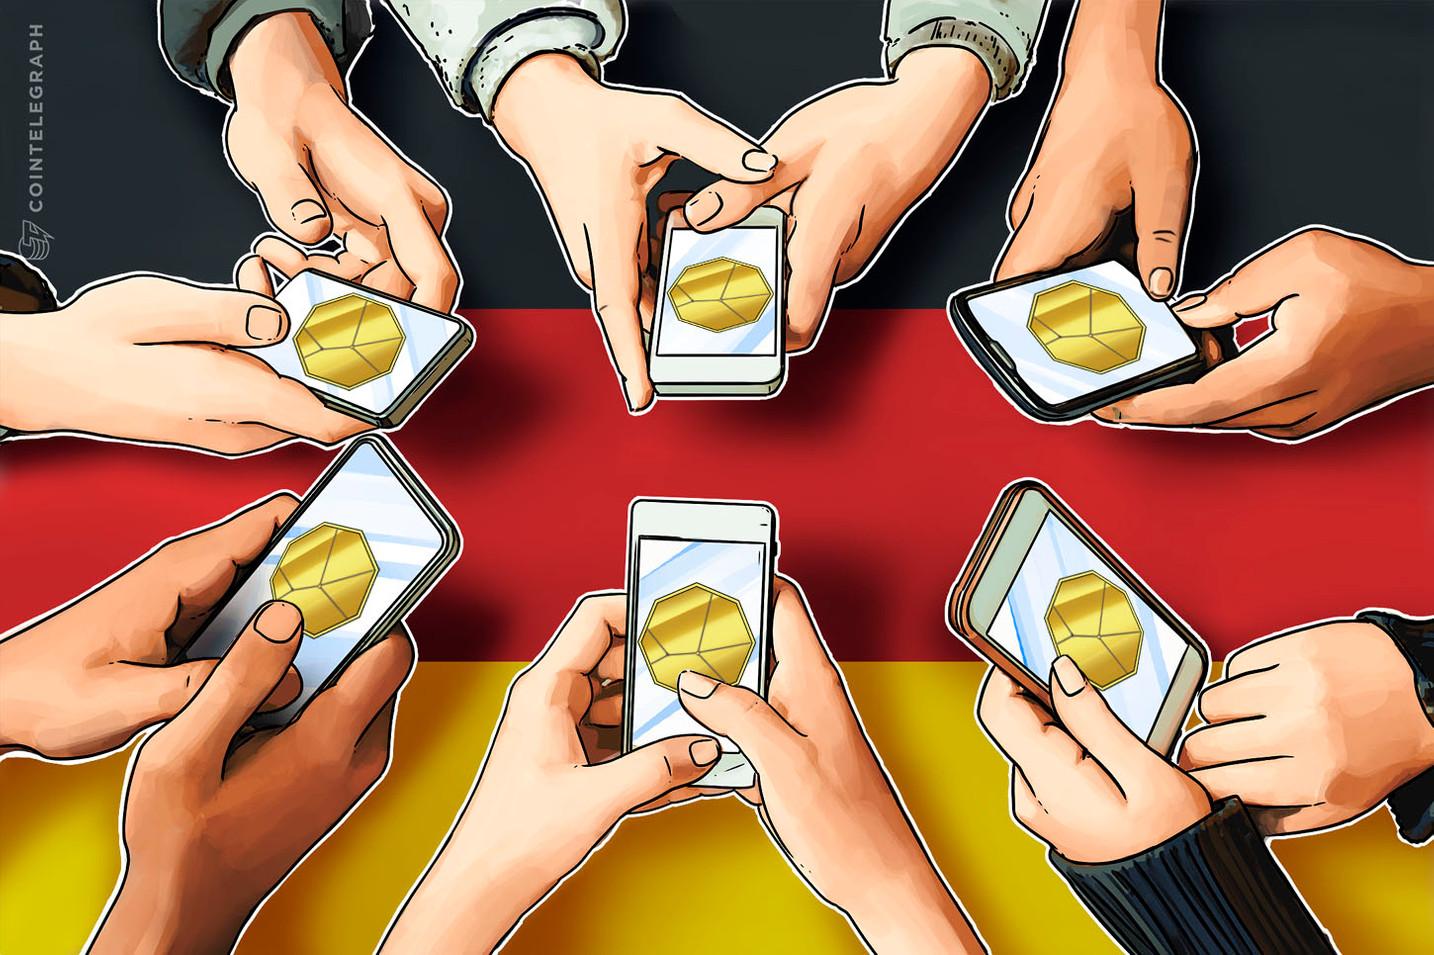 Nemačka: Druga najveća berza najavljuje lansiranje aplikacije za trgovanje kriptovalutama bez naknada